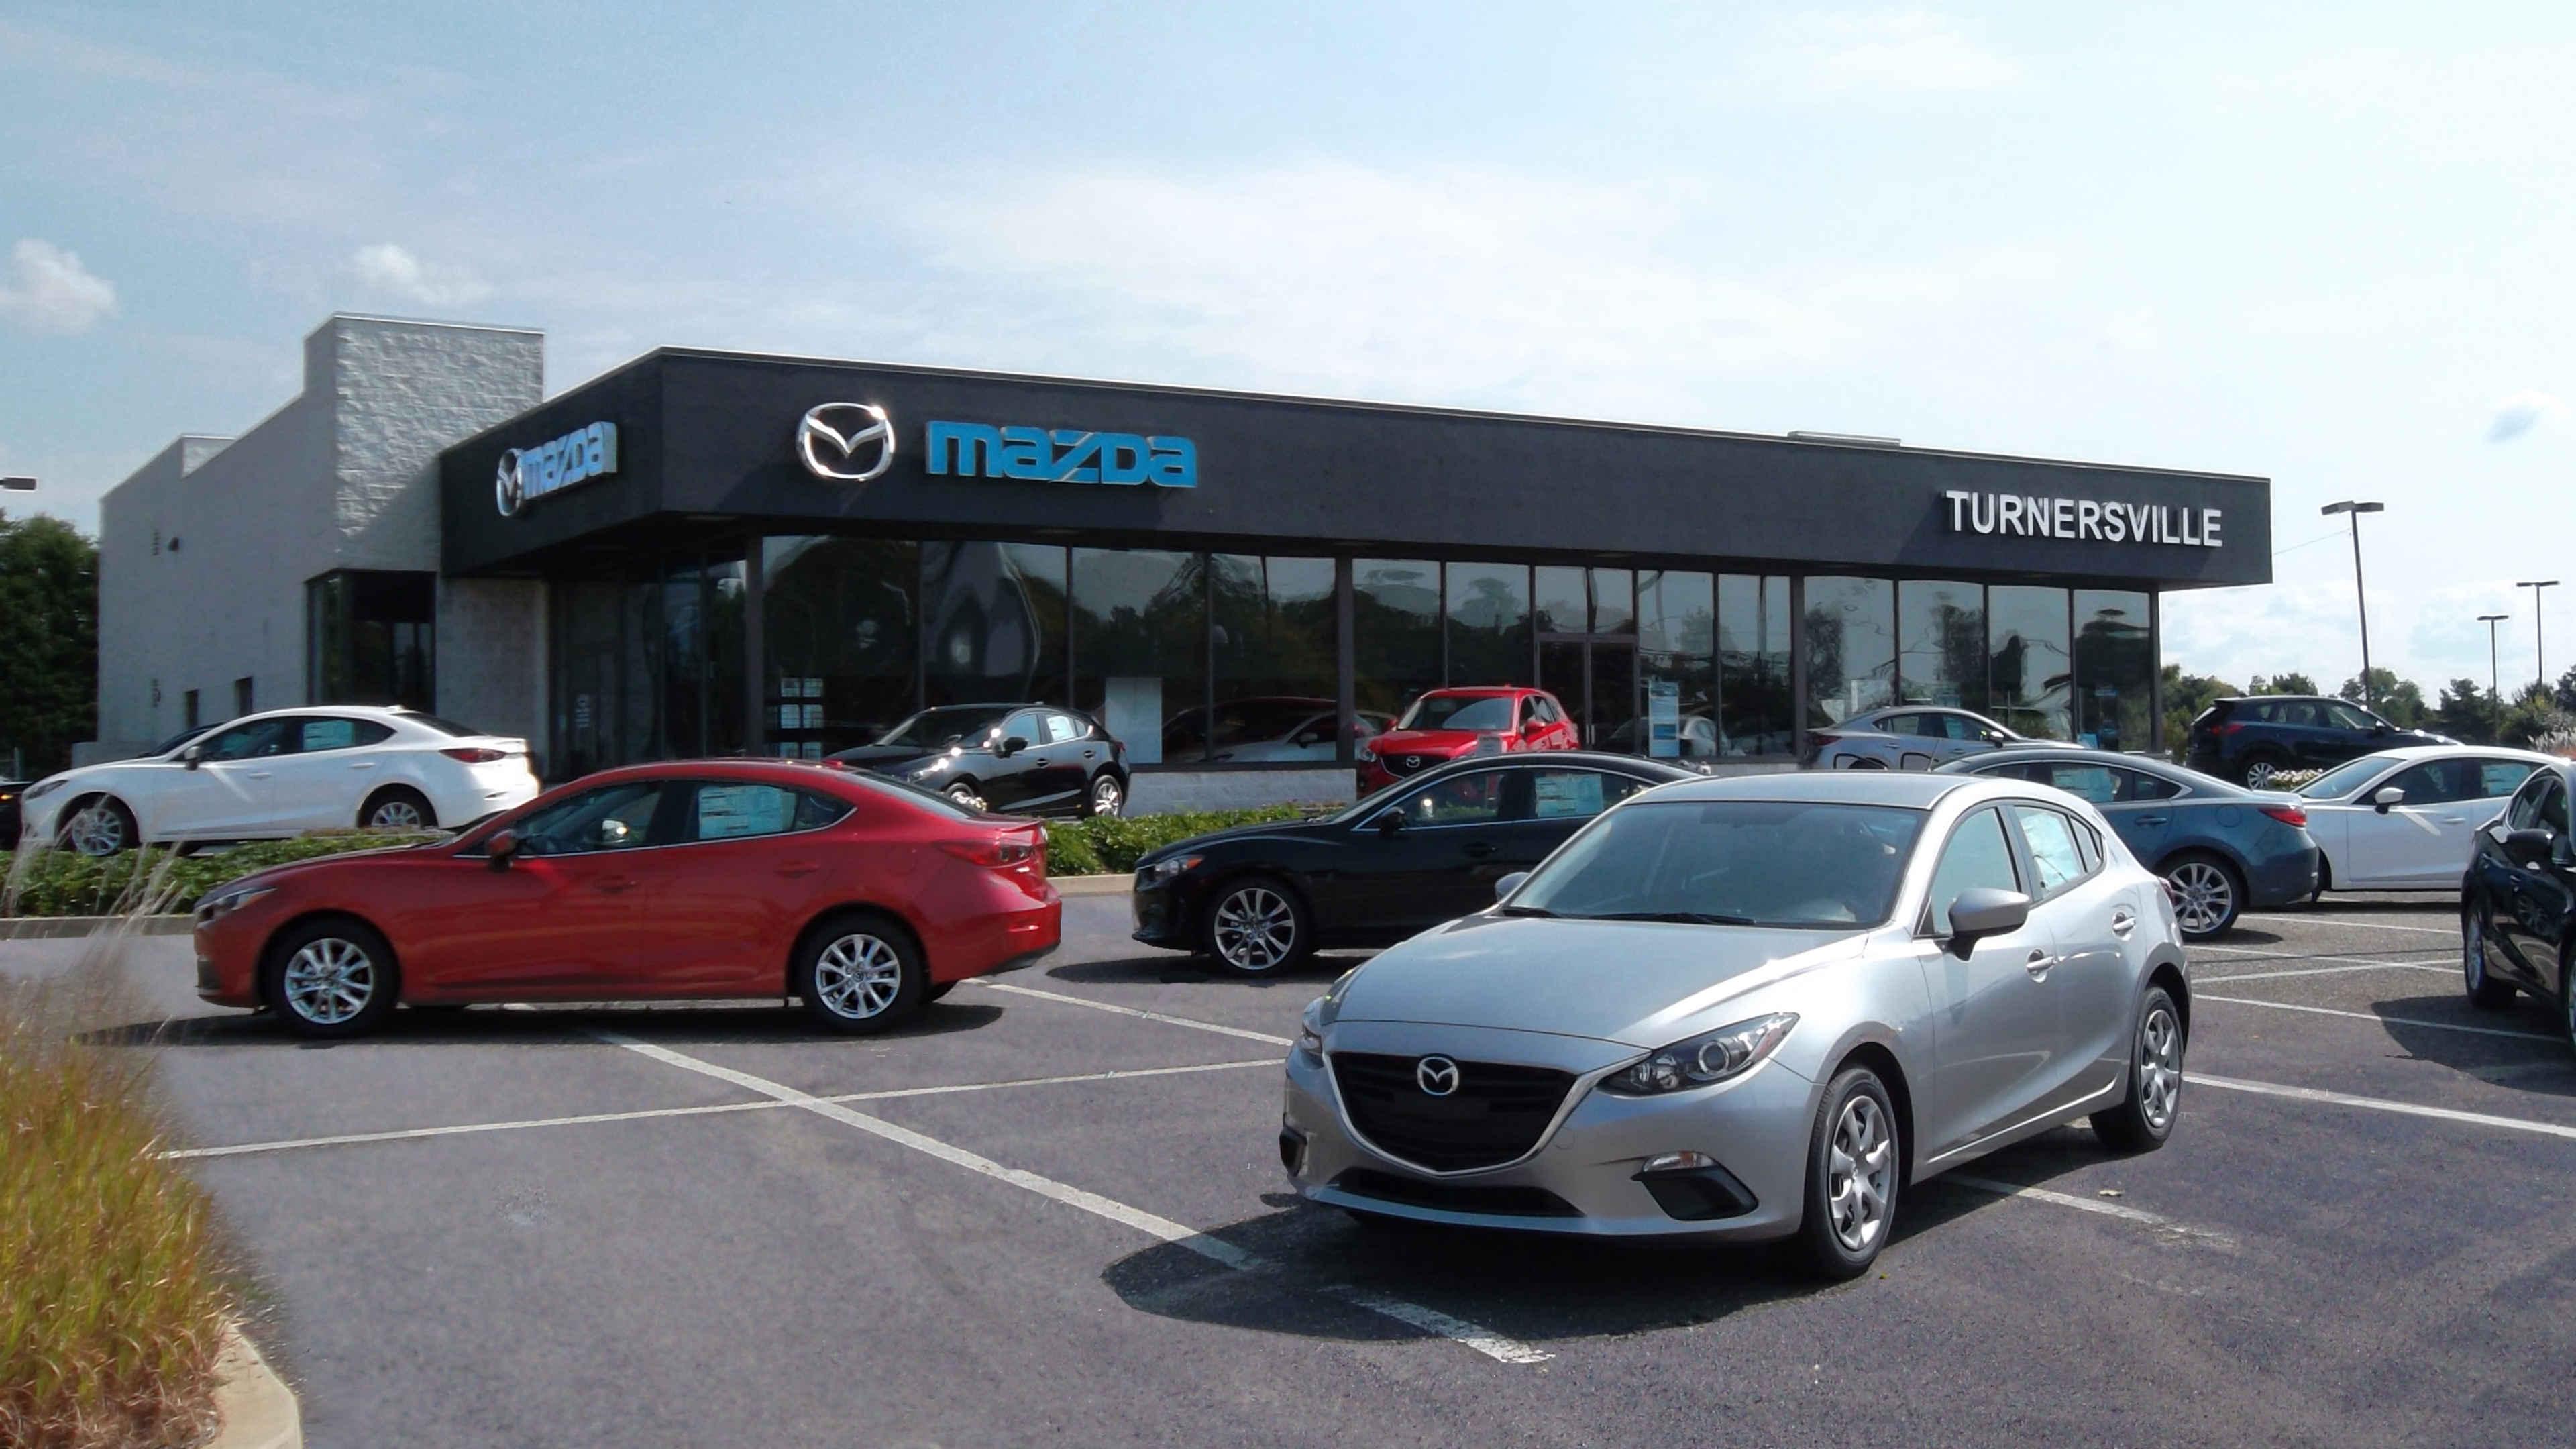 Mazda Mx 5 Rf Cena >> Mazda | Autohled.cz